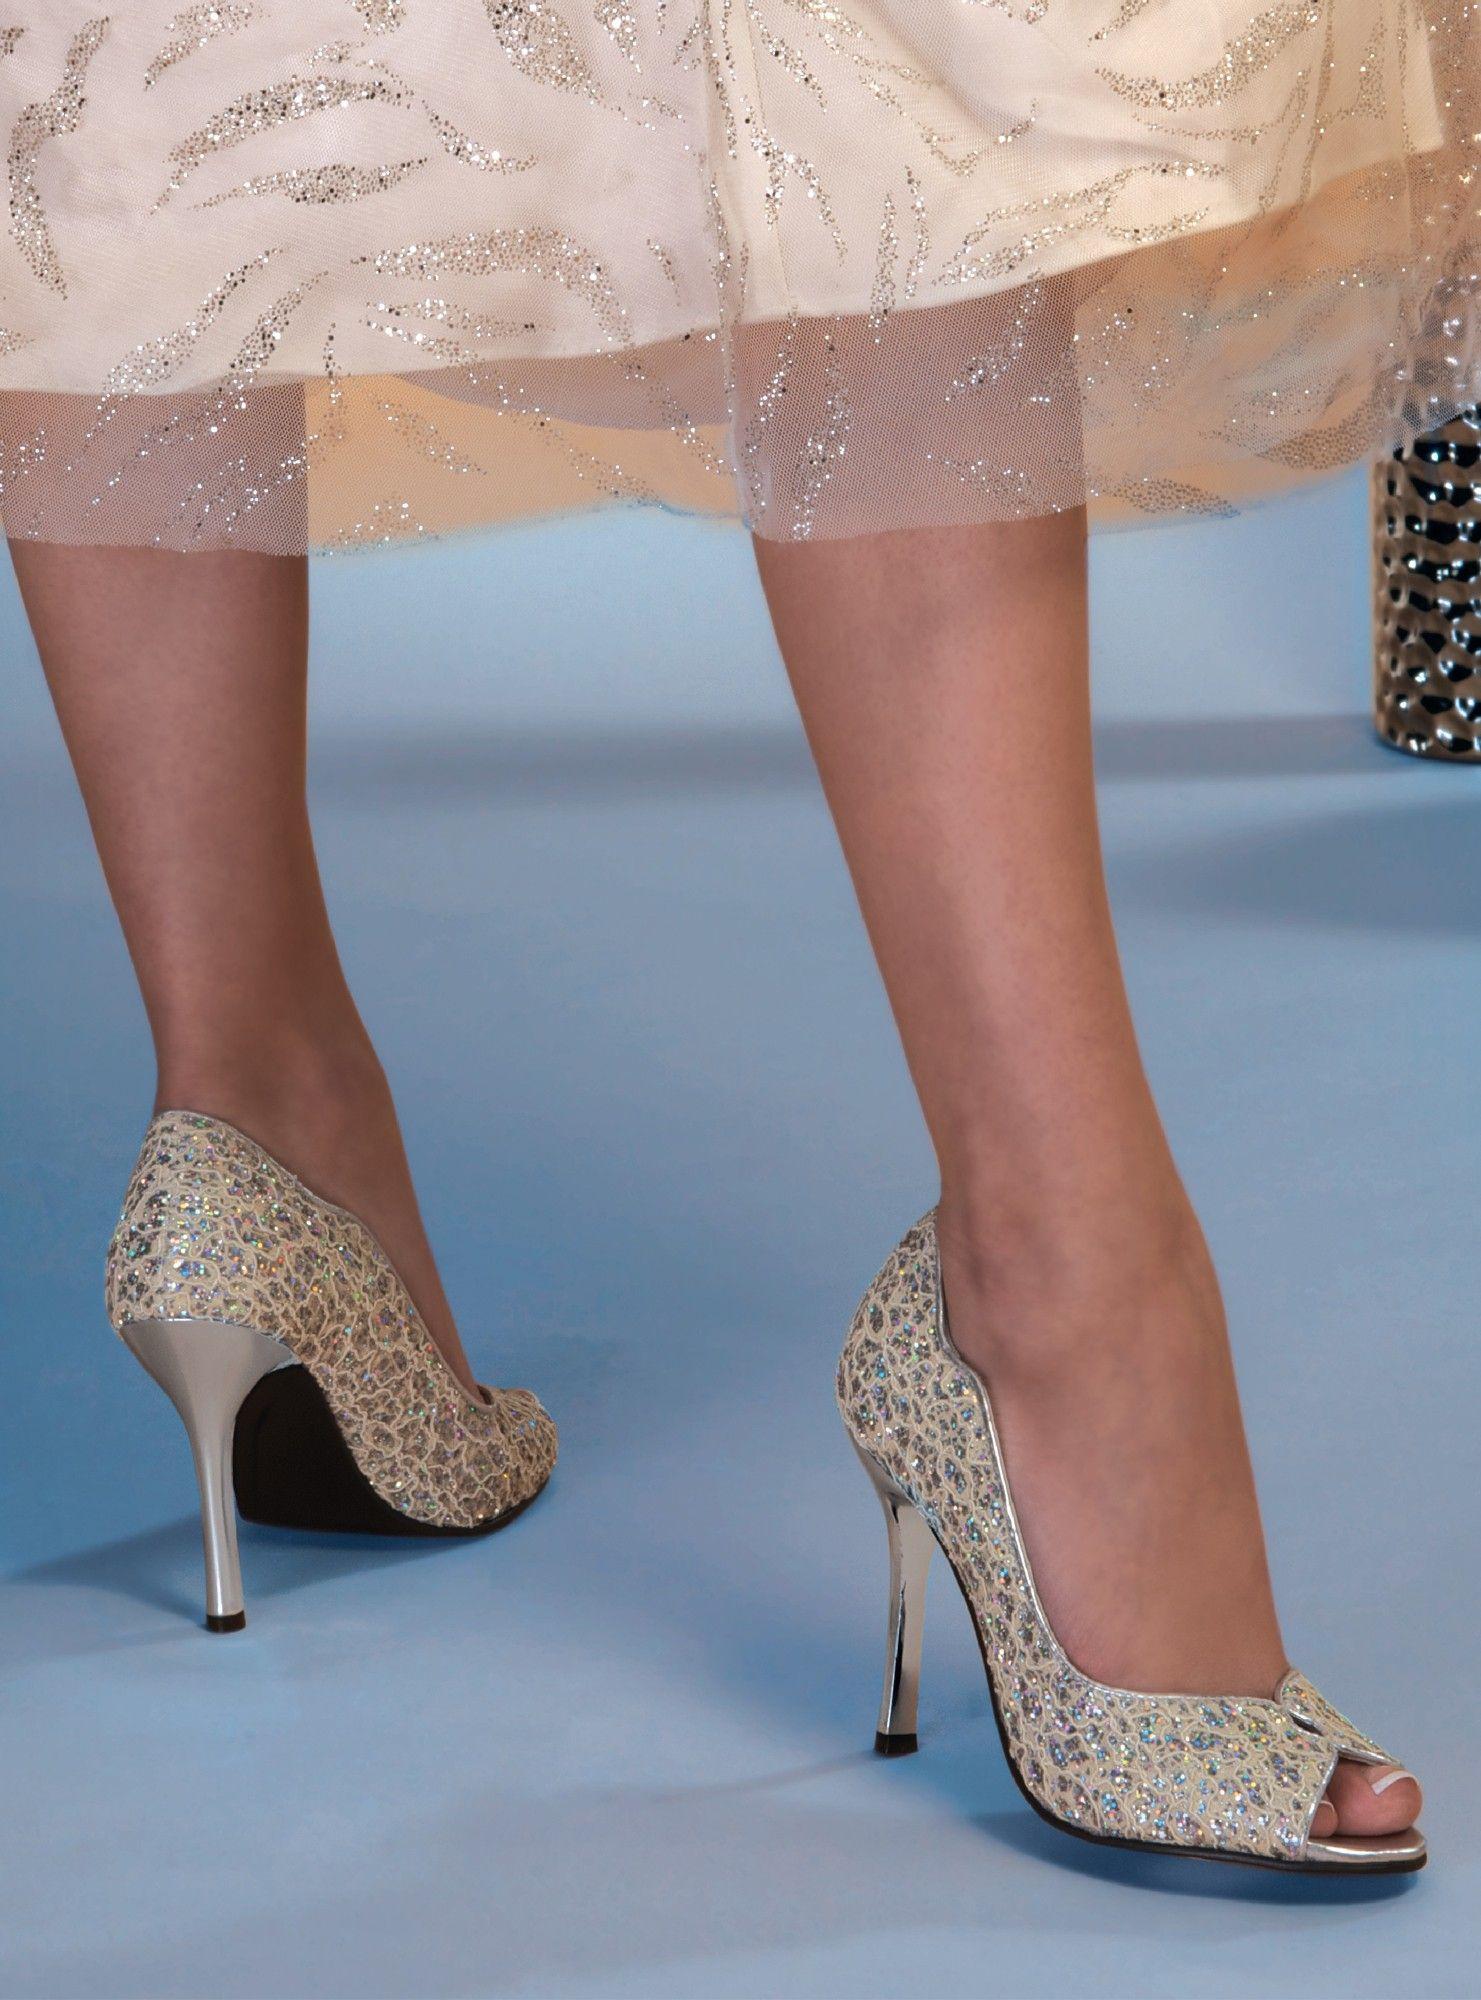 Touch Ups Shoes - Style Ellie 481 [Ellie] - $62.00 : Wedding Dresses ...